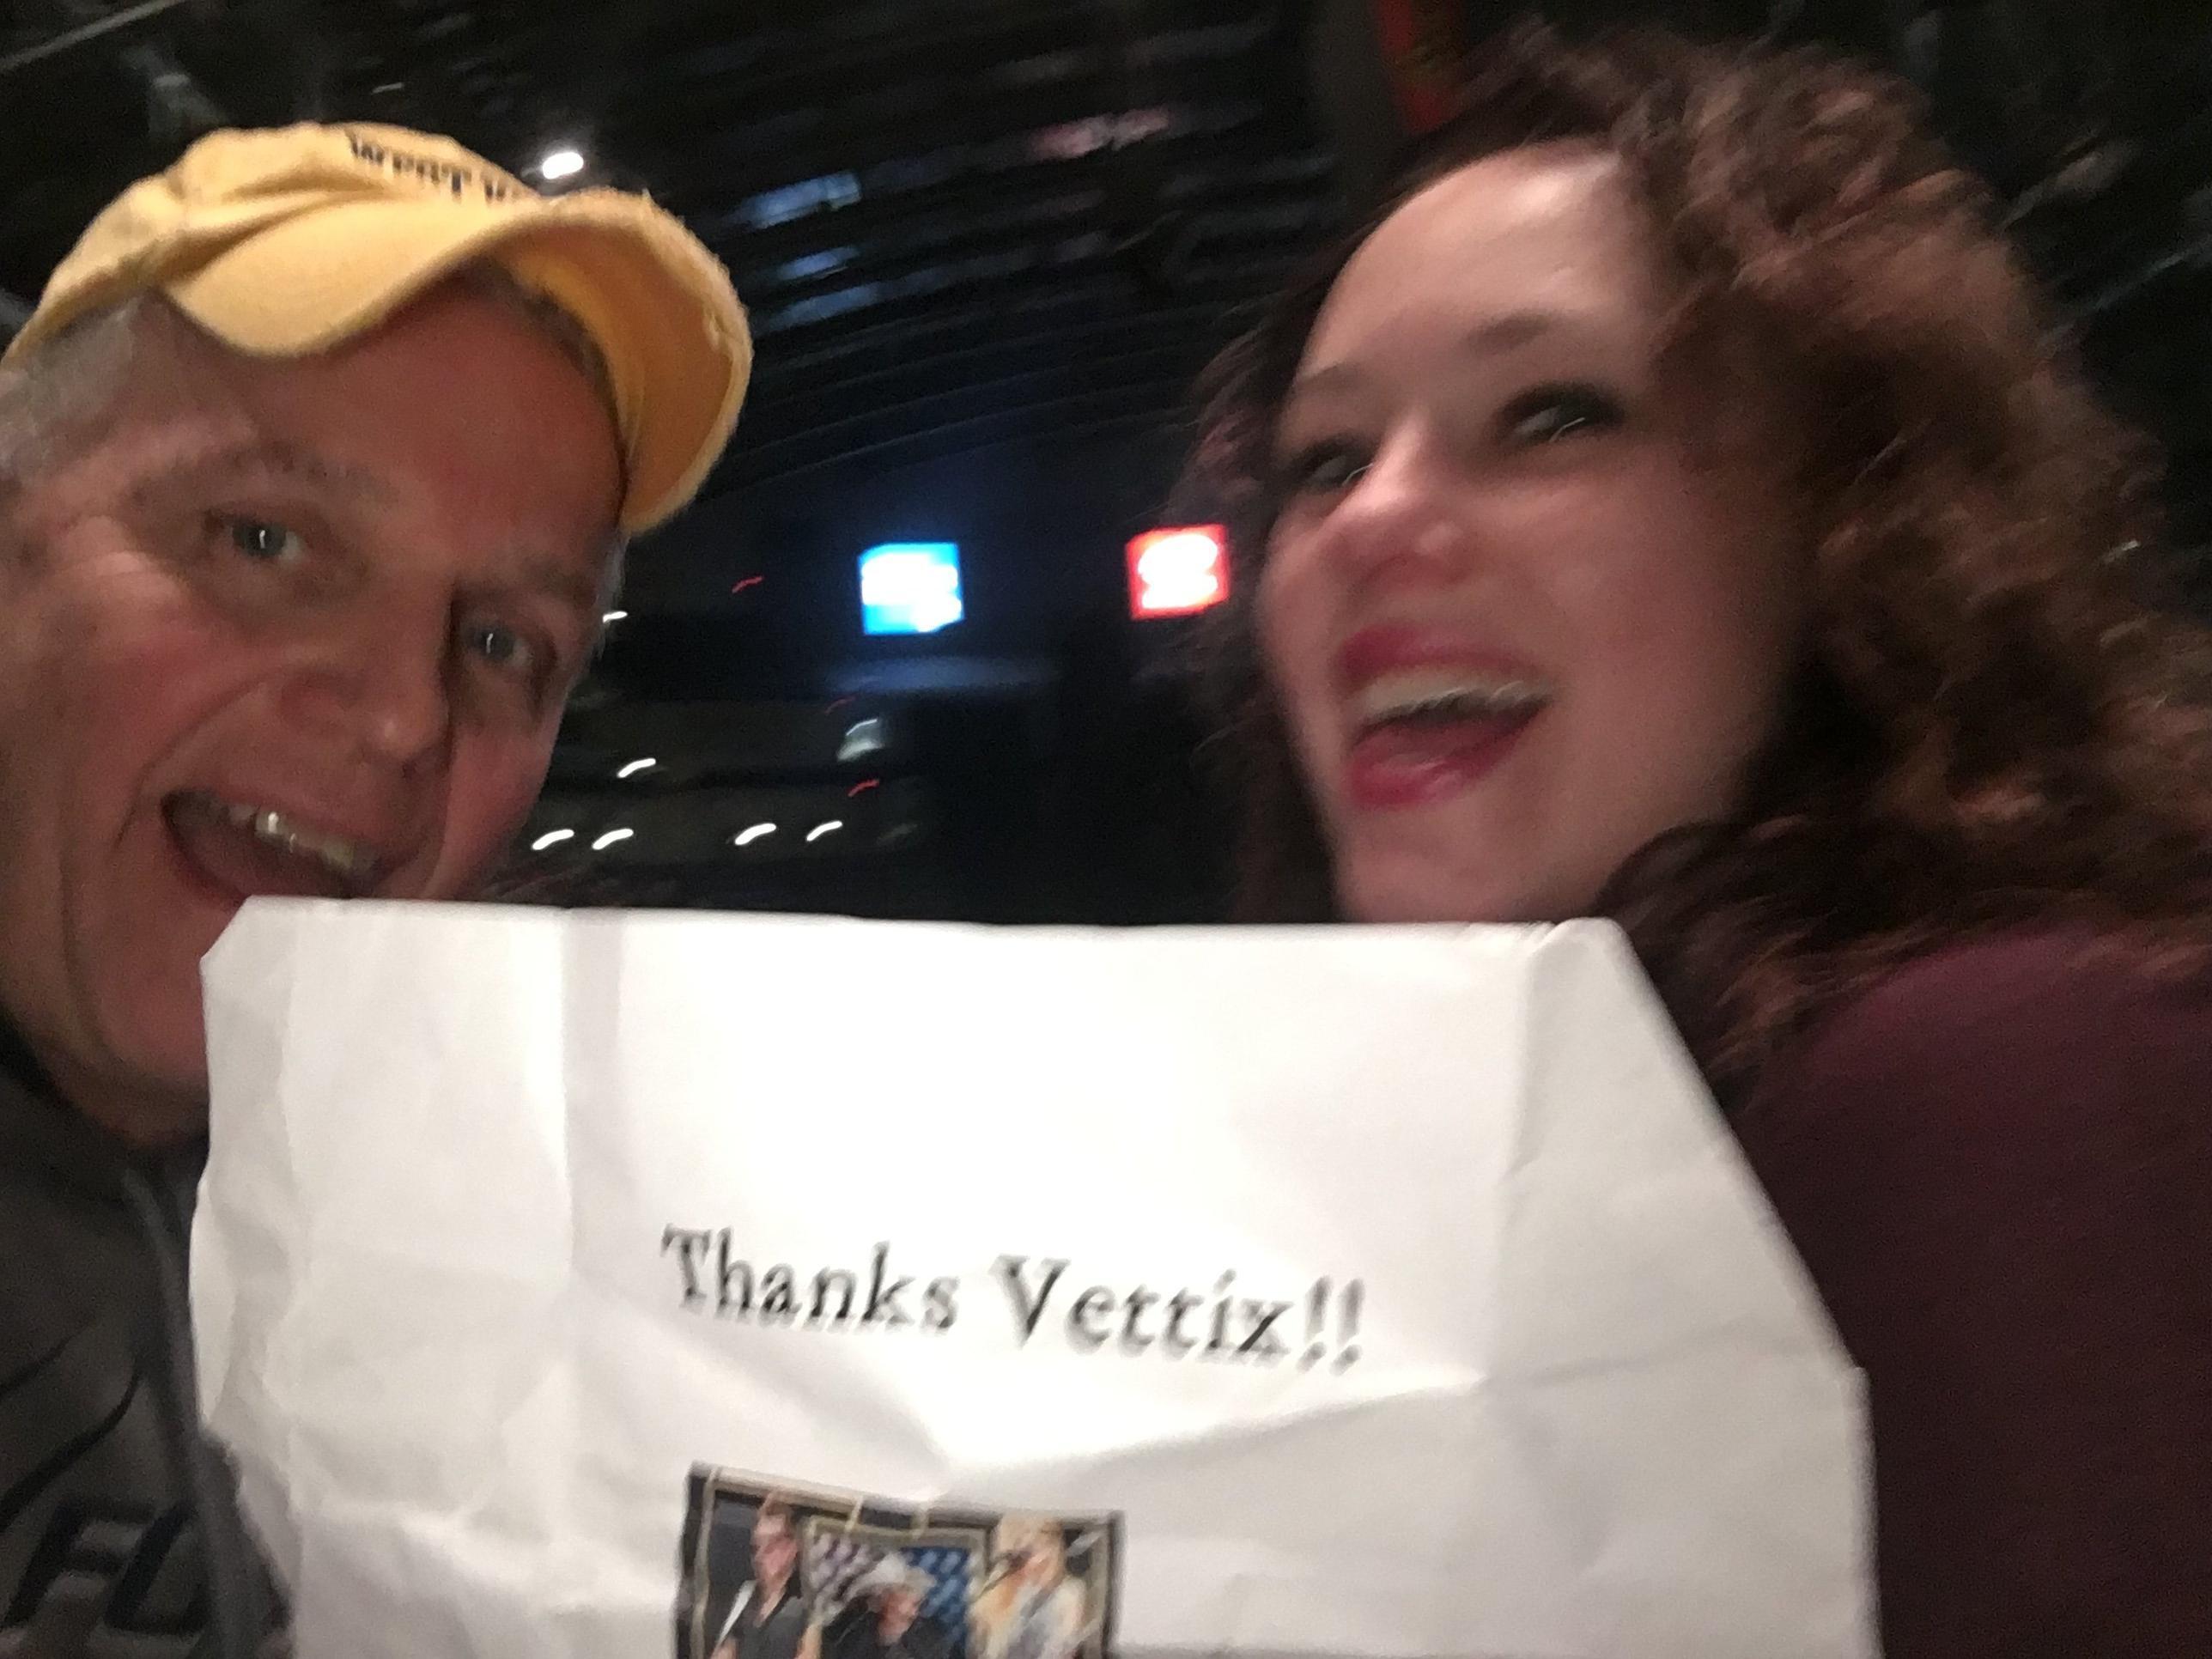 Vet Tixer Thank You Messages